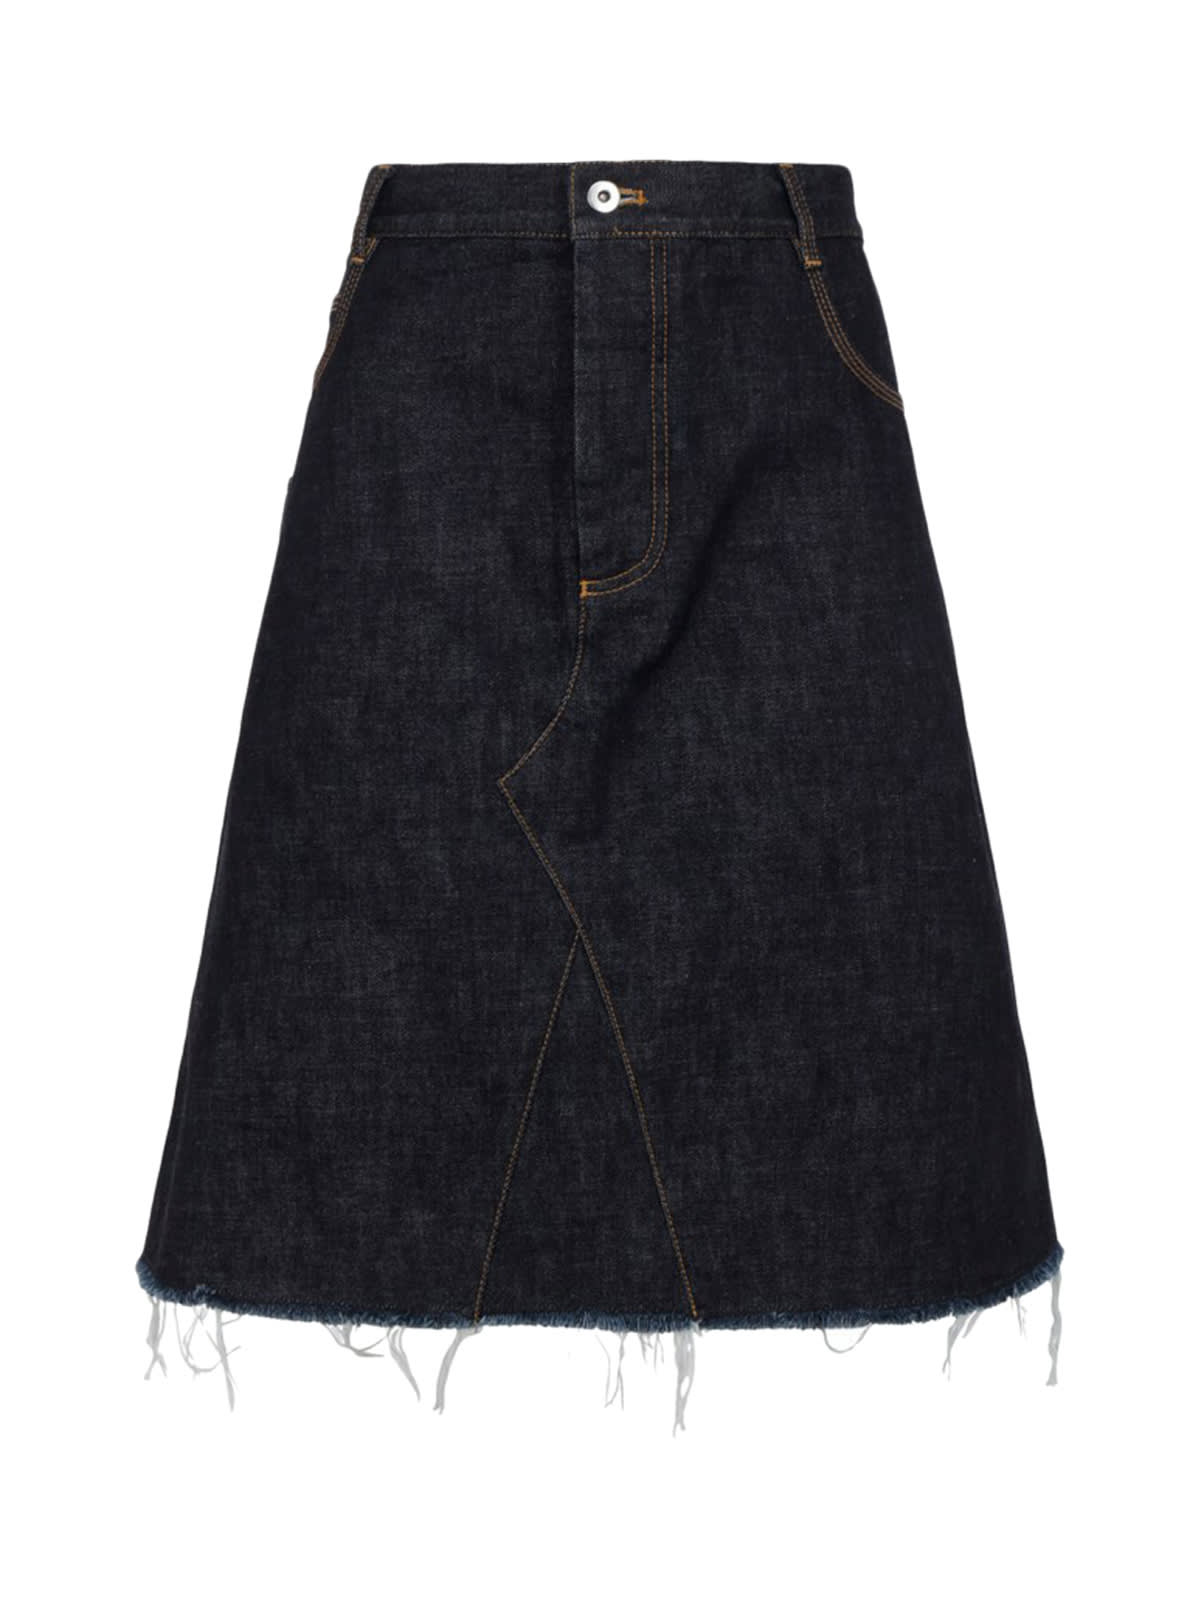 Bottega Veneta Skirt Raw Denim